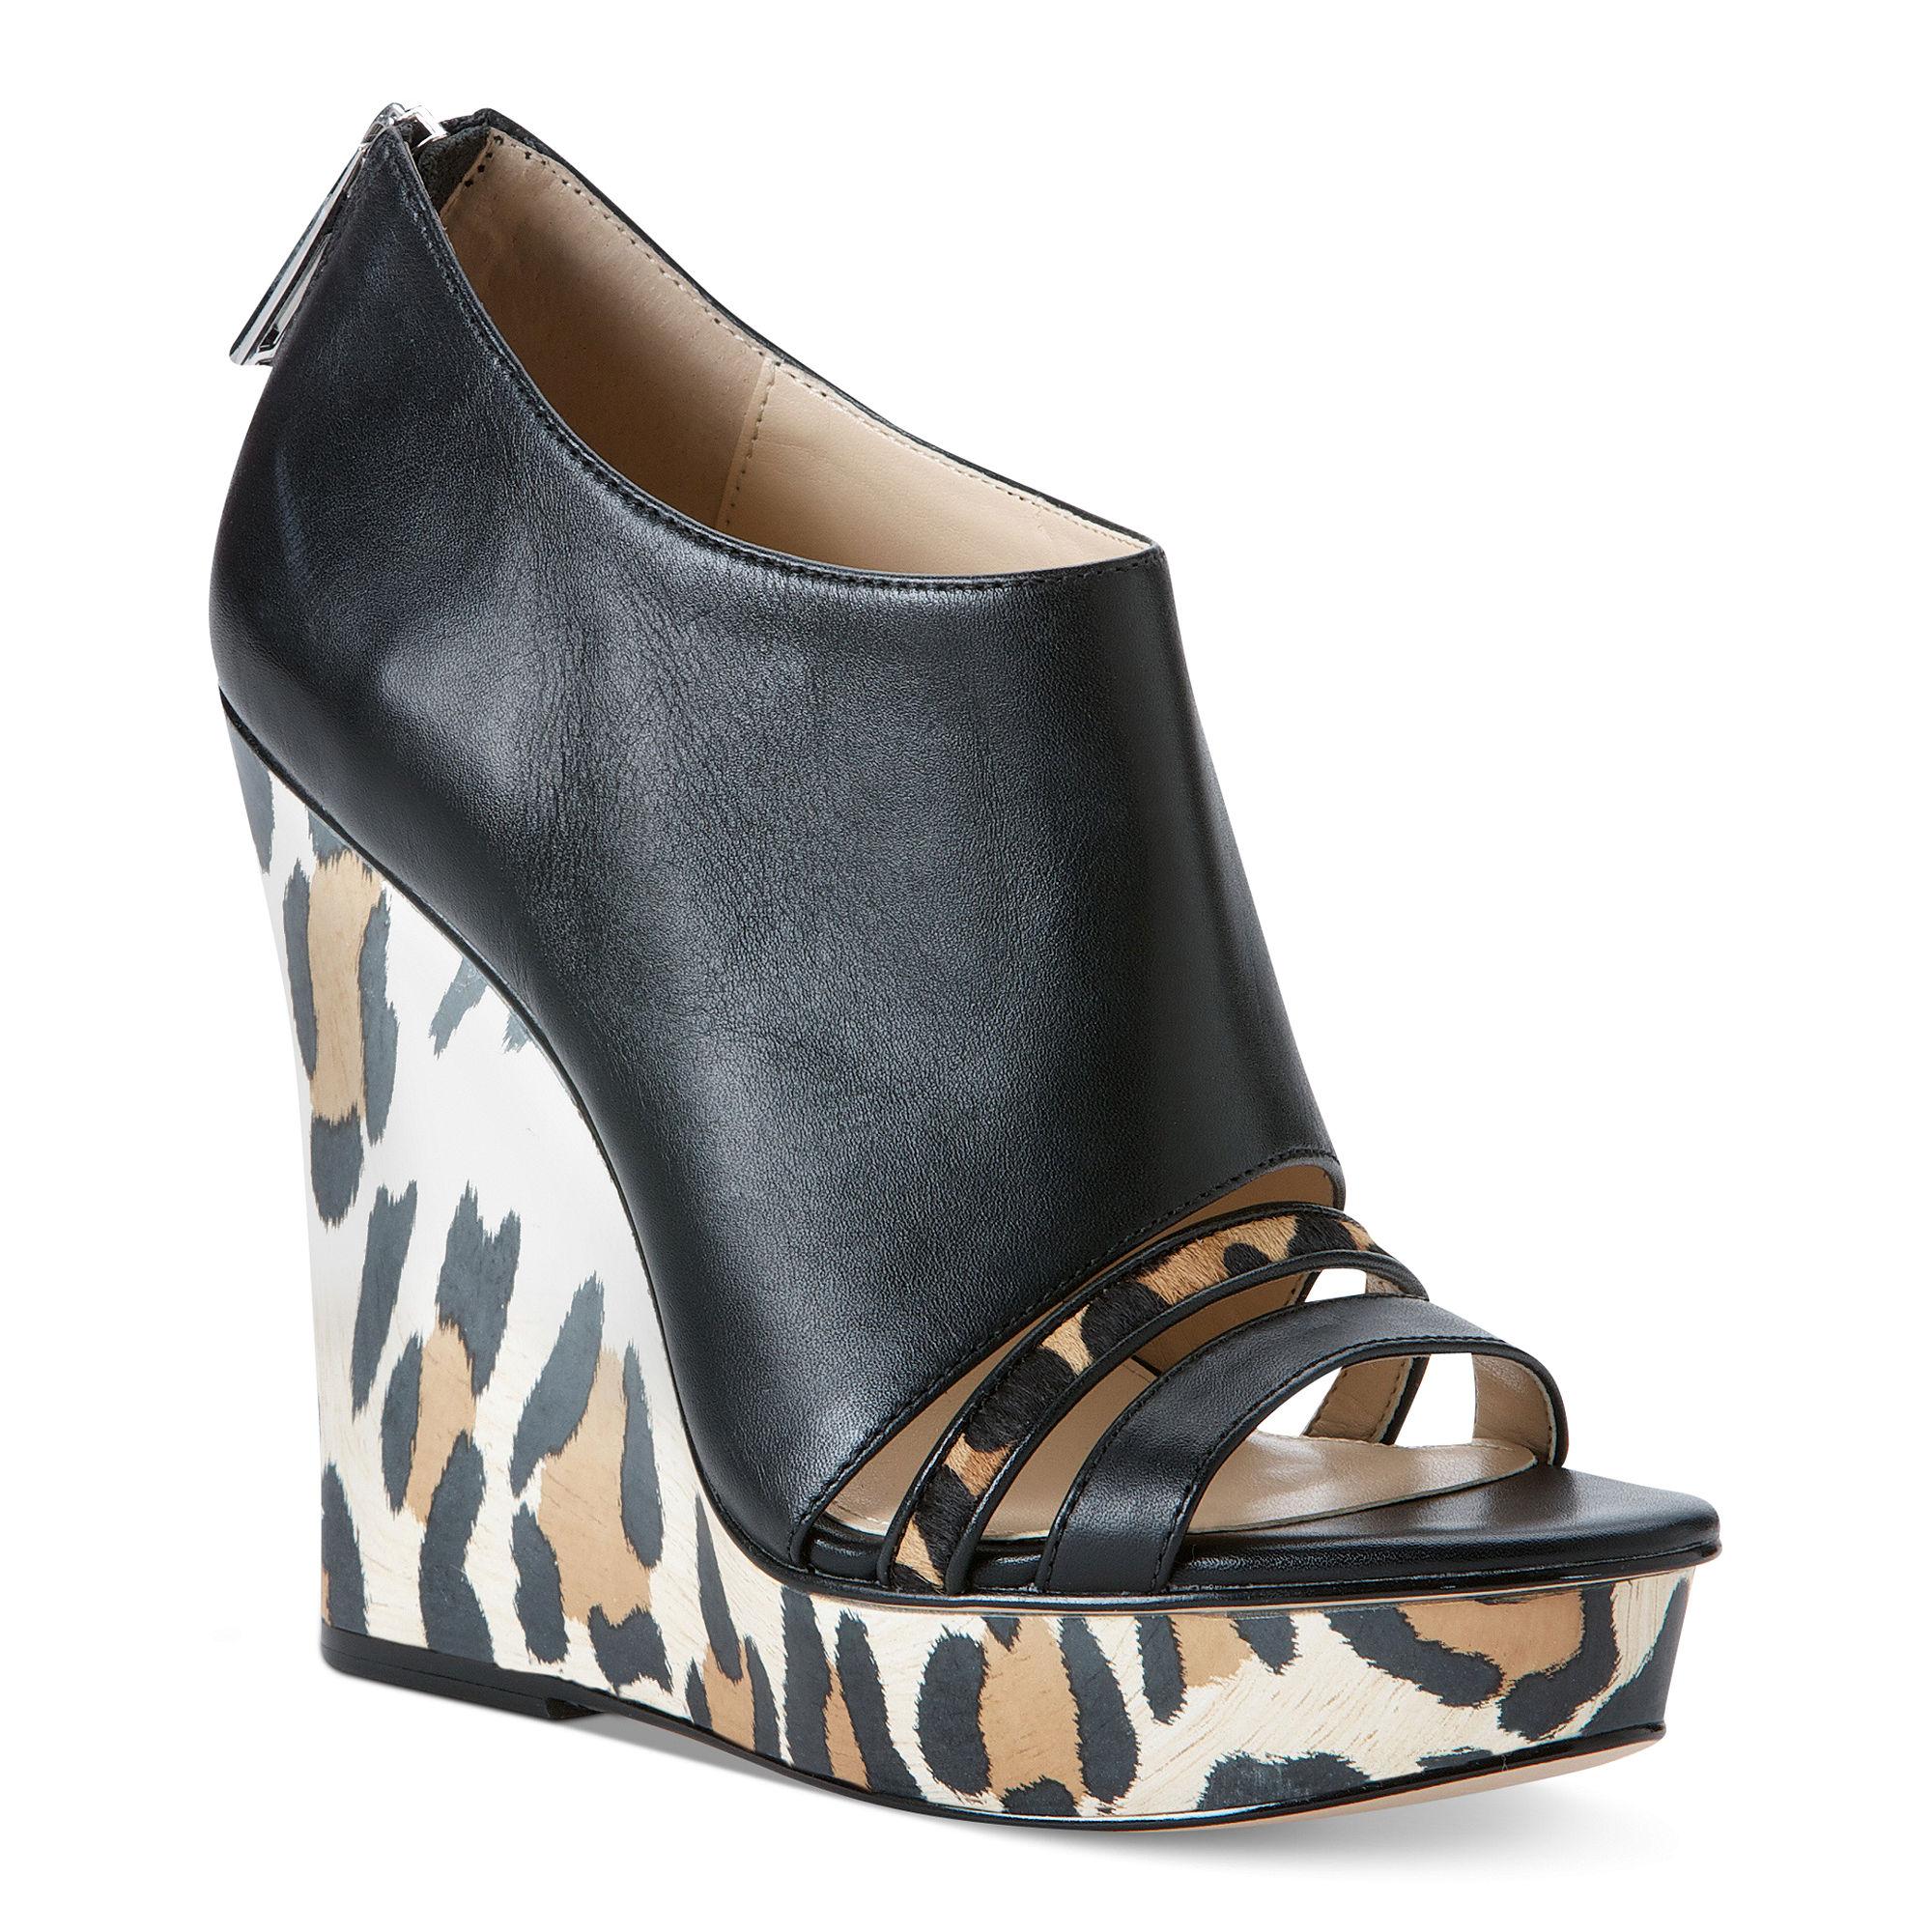 fc7f8c53e3a5 Lyst - Calvin Klein Danette Platform Wedge Sandals in Black